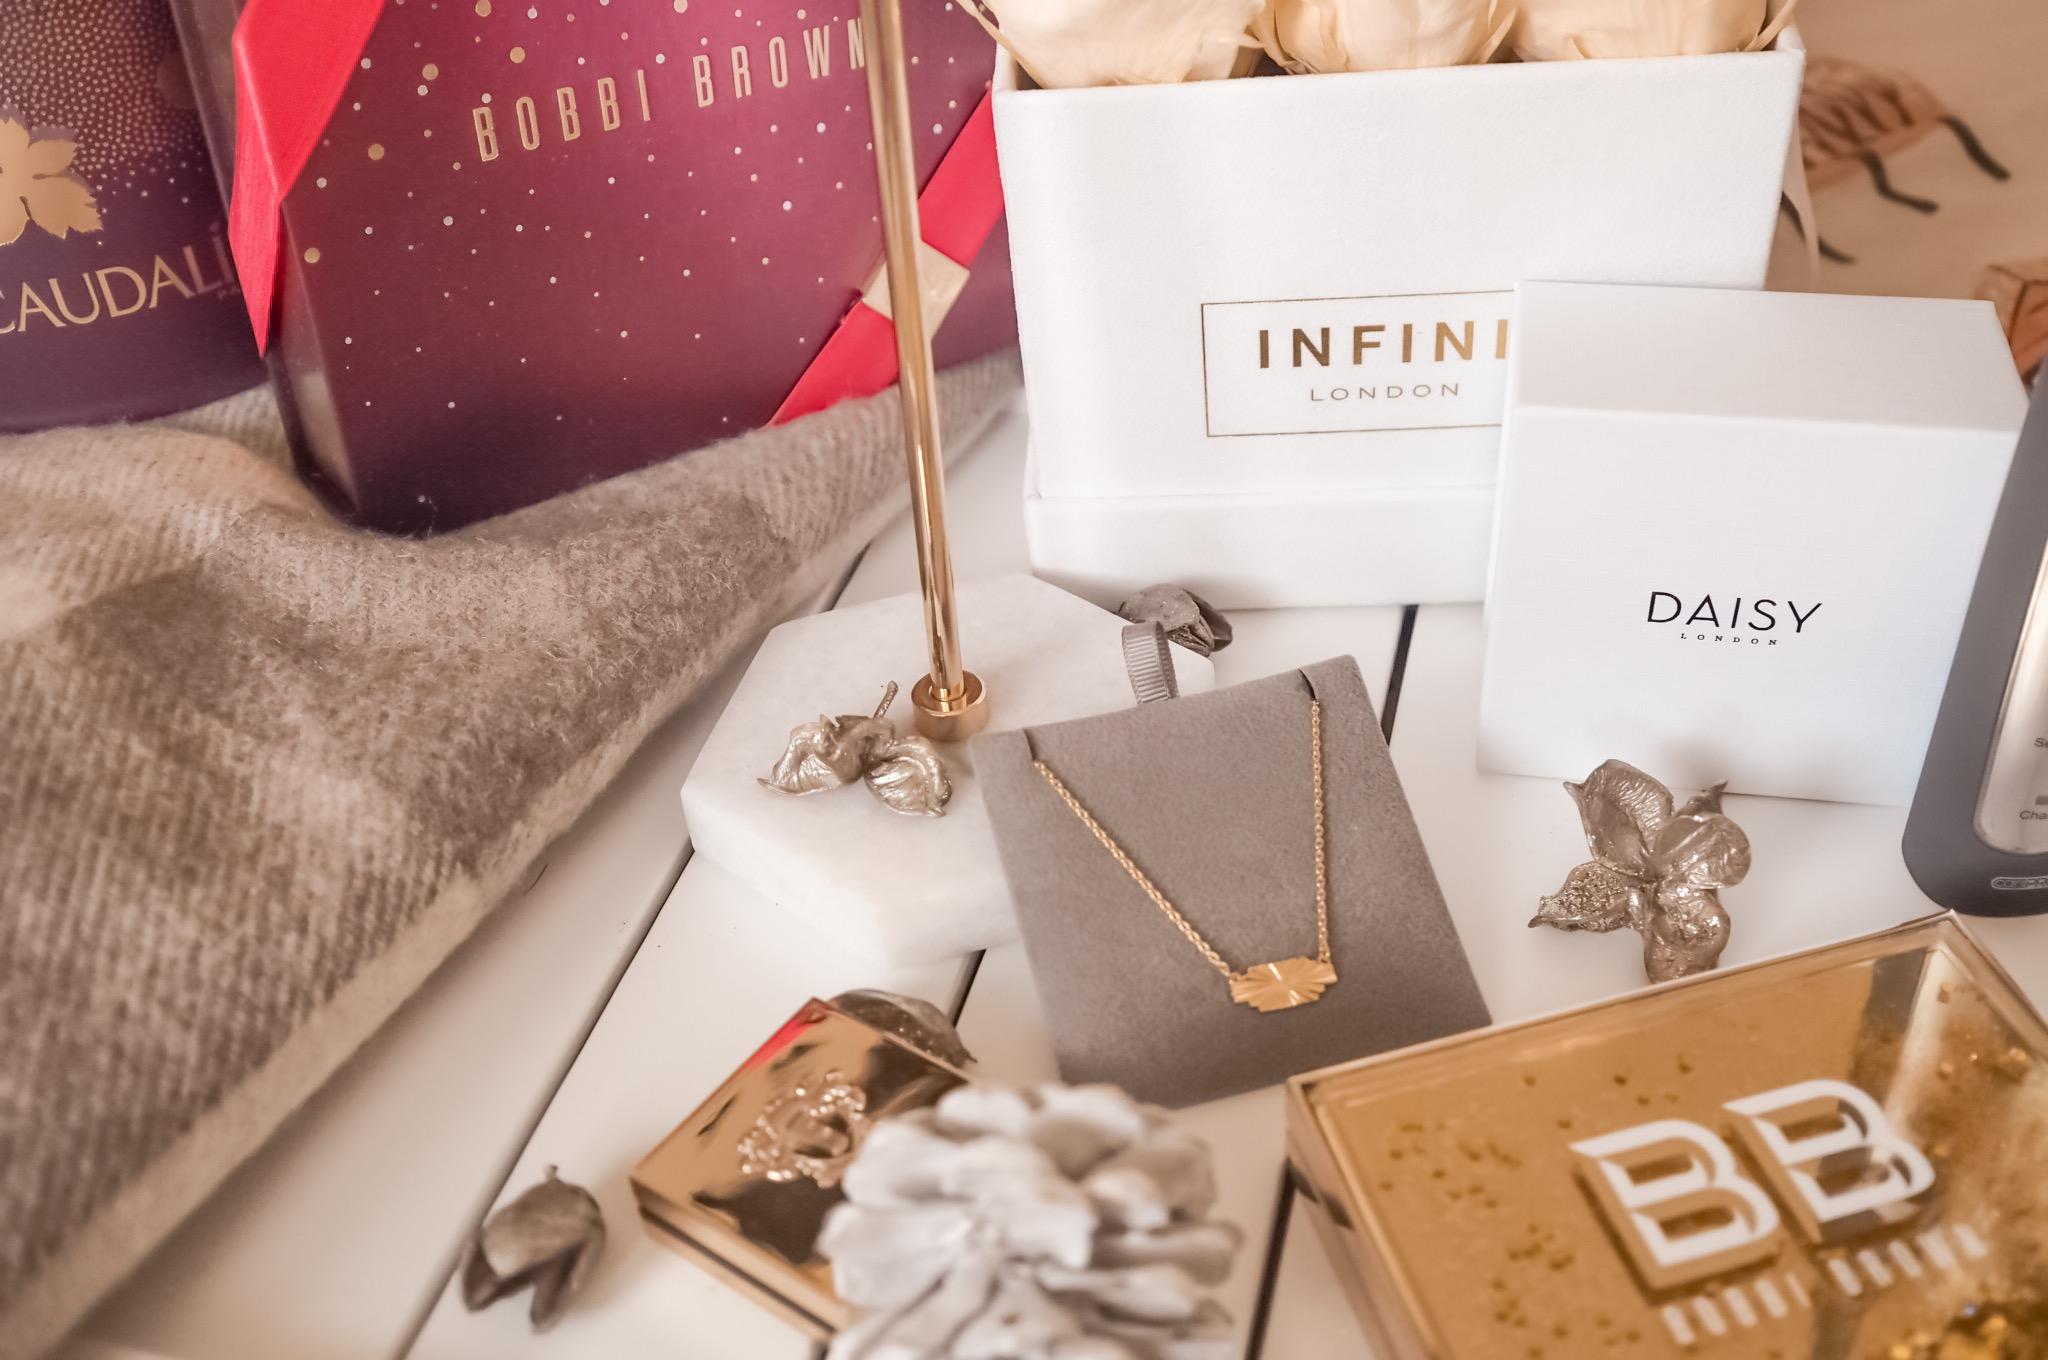 Christmas gift guide 2018   ultimate christmas gift guide 2018   christmas gift ideas for him   christmas gift ideas for her